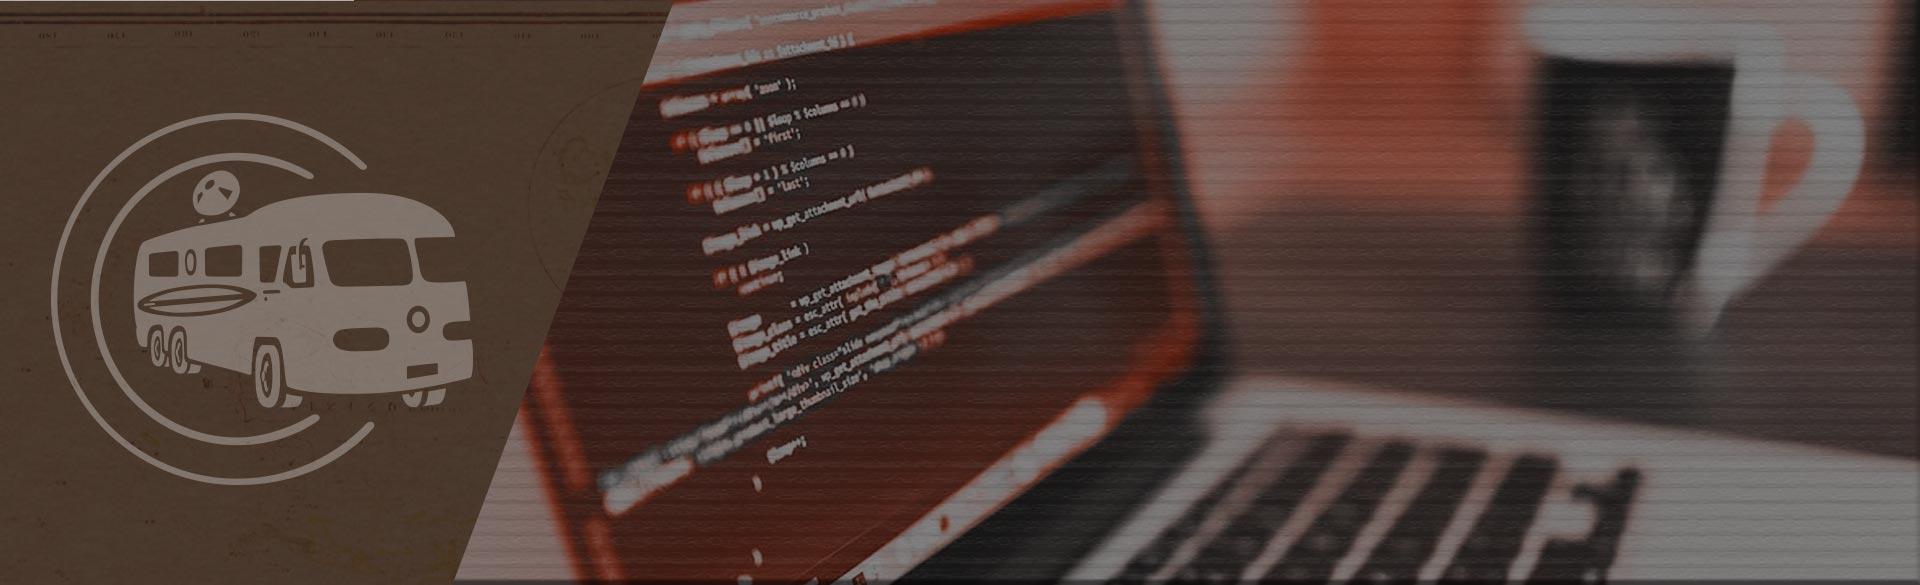 advanced wordpress developers